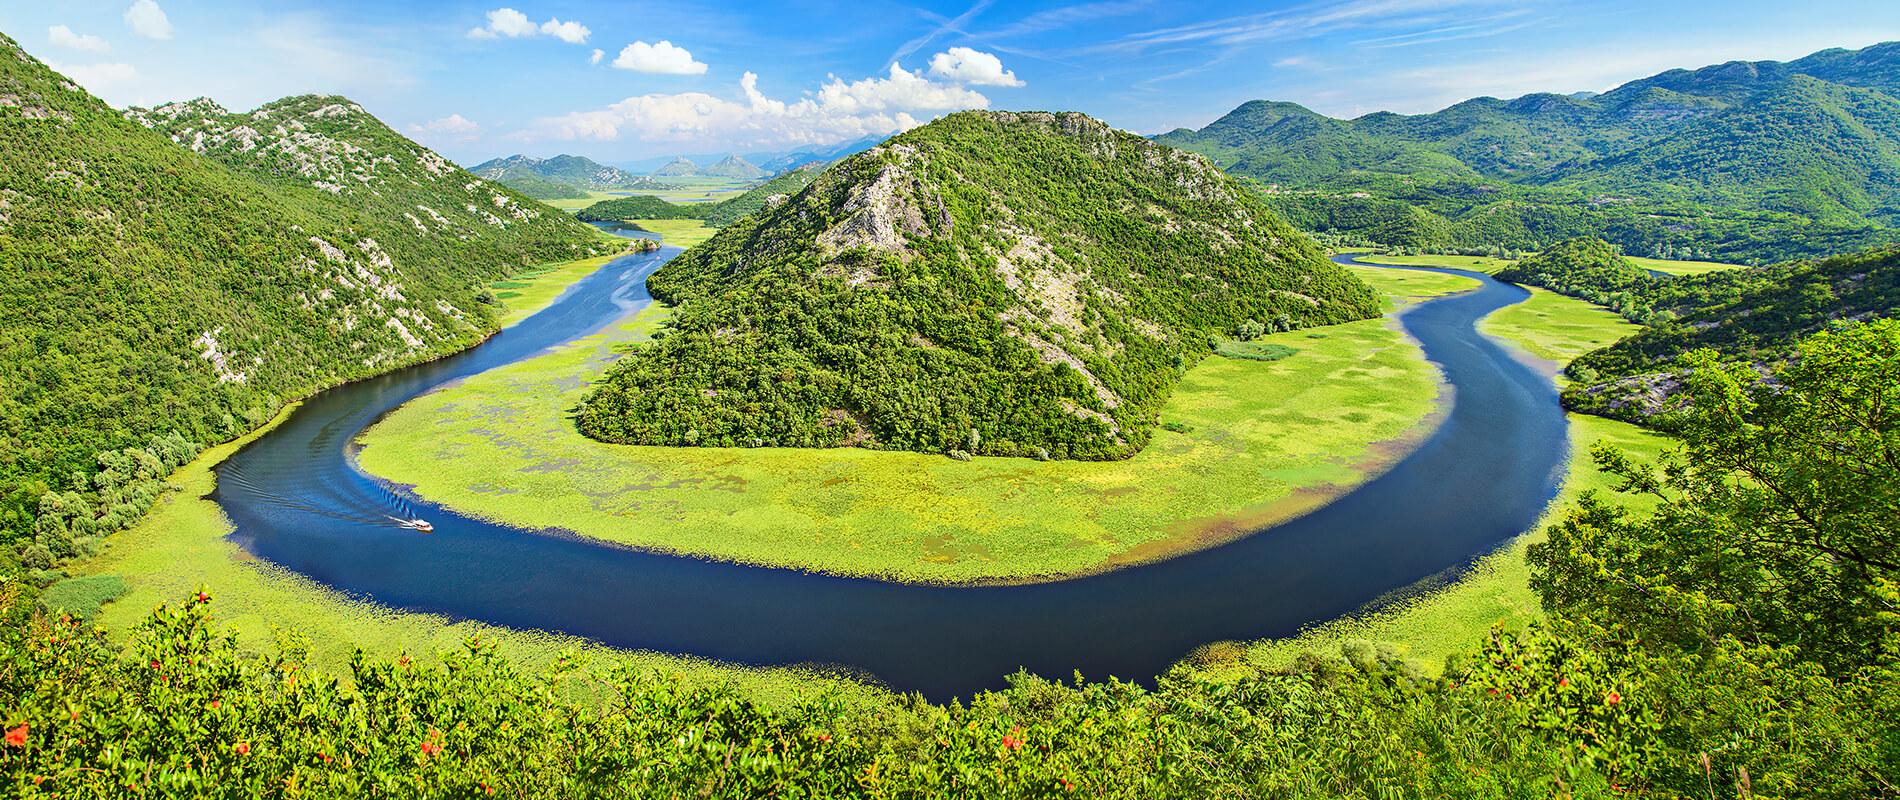 Lago di Skadar, bellezza naturale dei Balcani